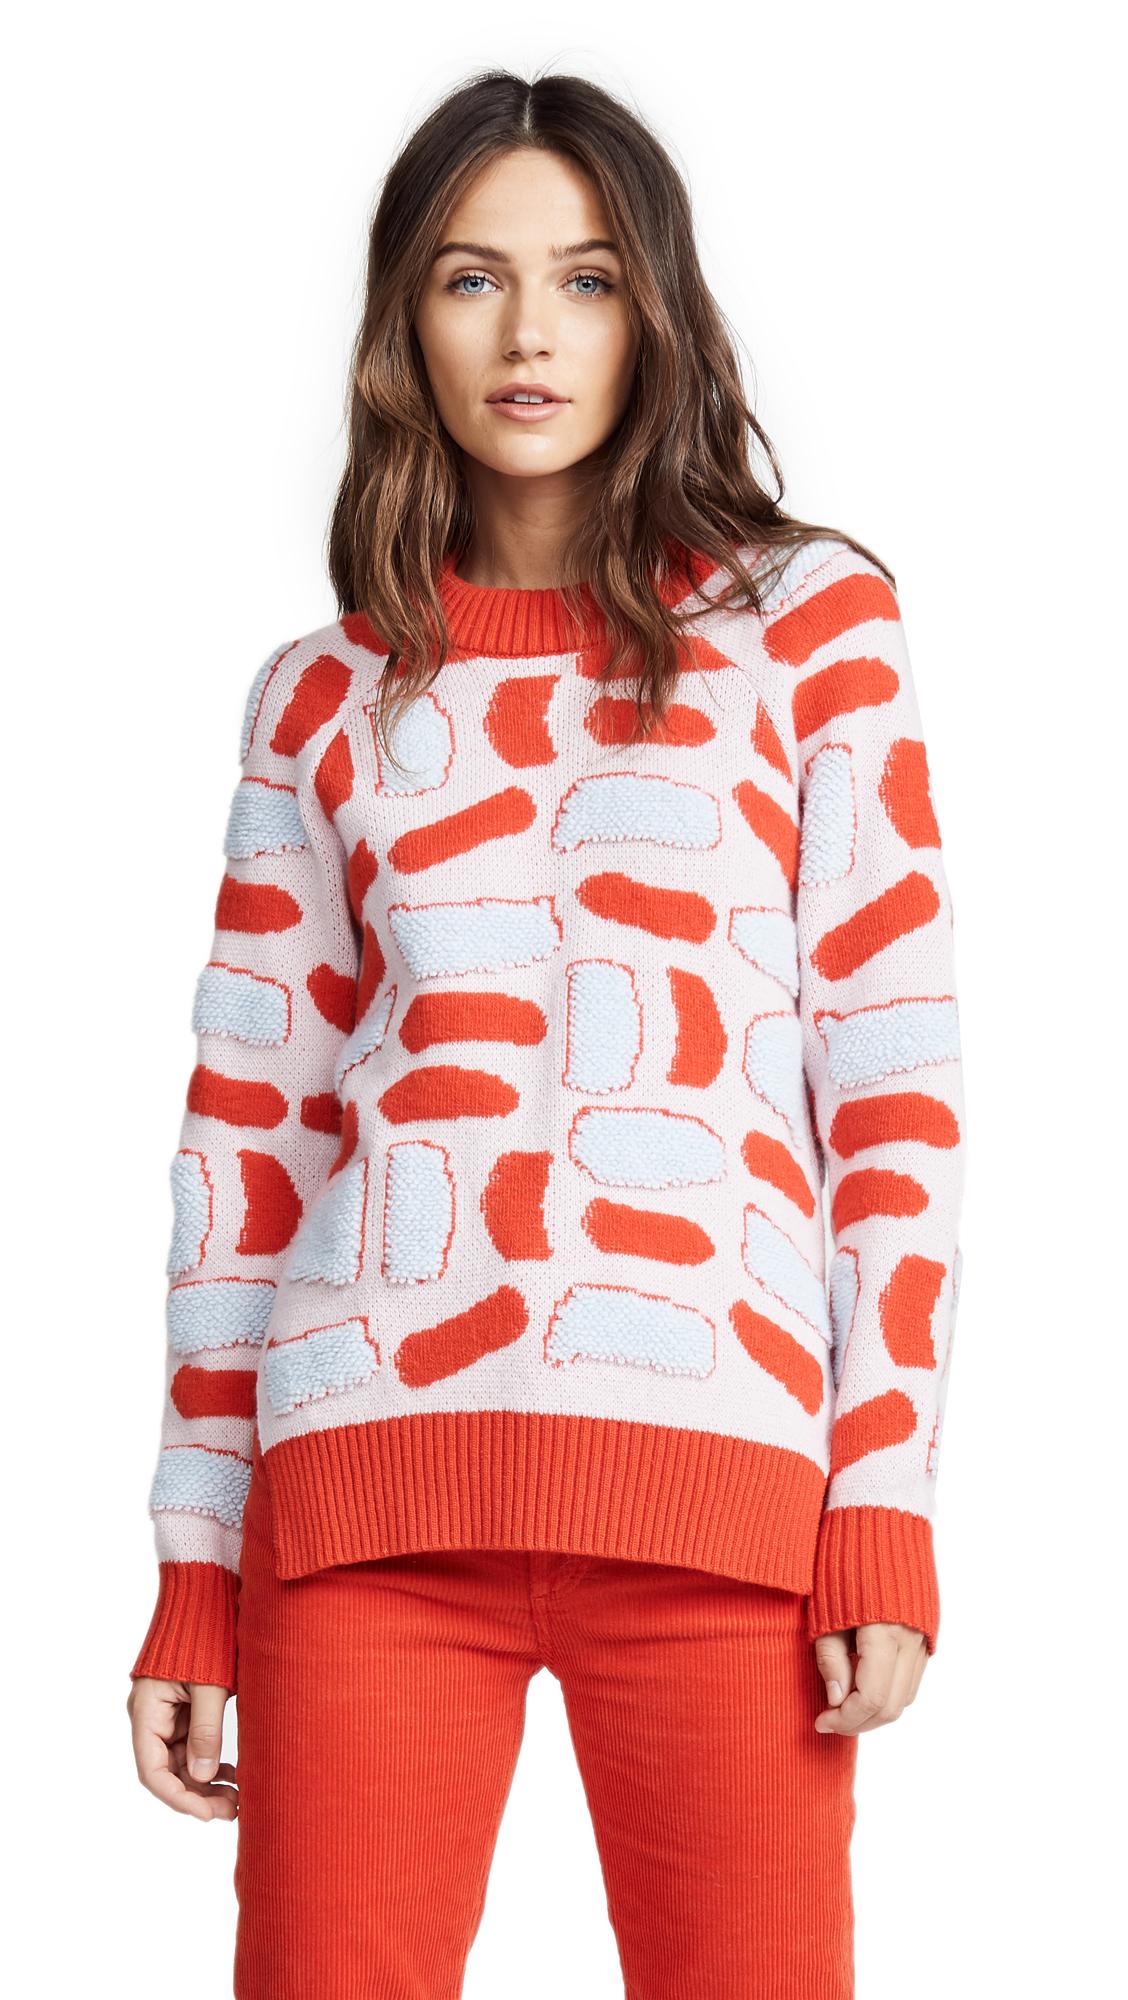 Novis Barnsley Jacquard Sweater In Rose/Carrot/Powder Blue